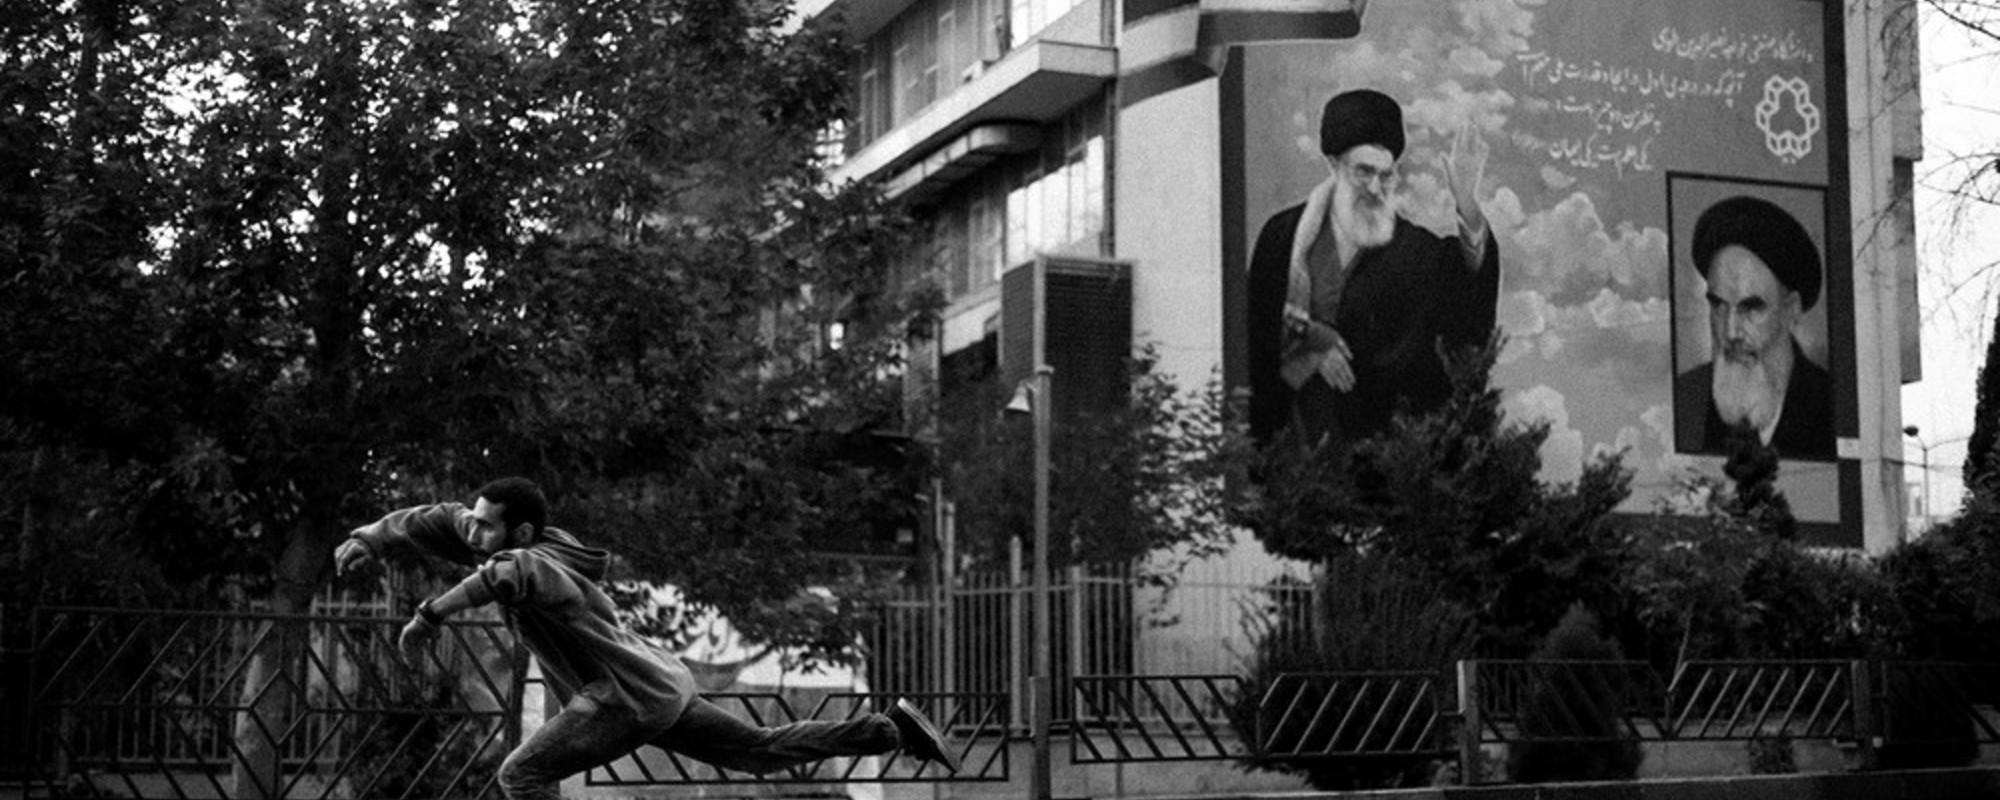 Billeder fra Irans spirende skaterkultur